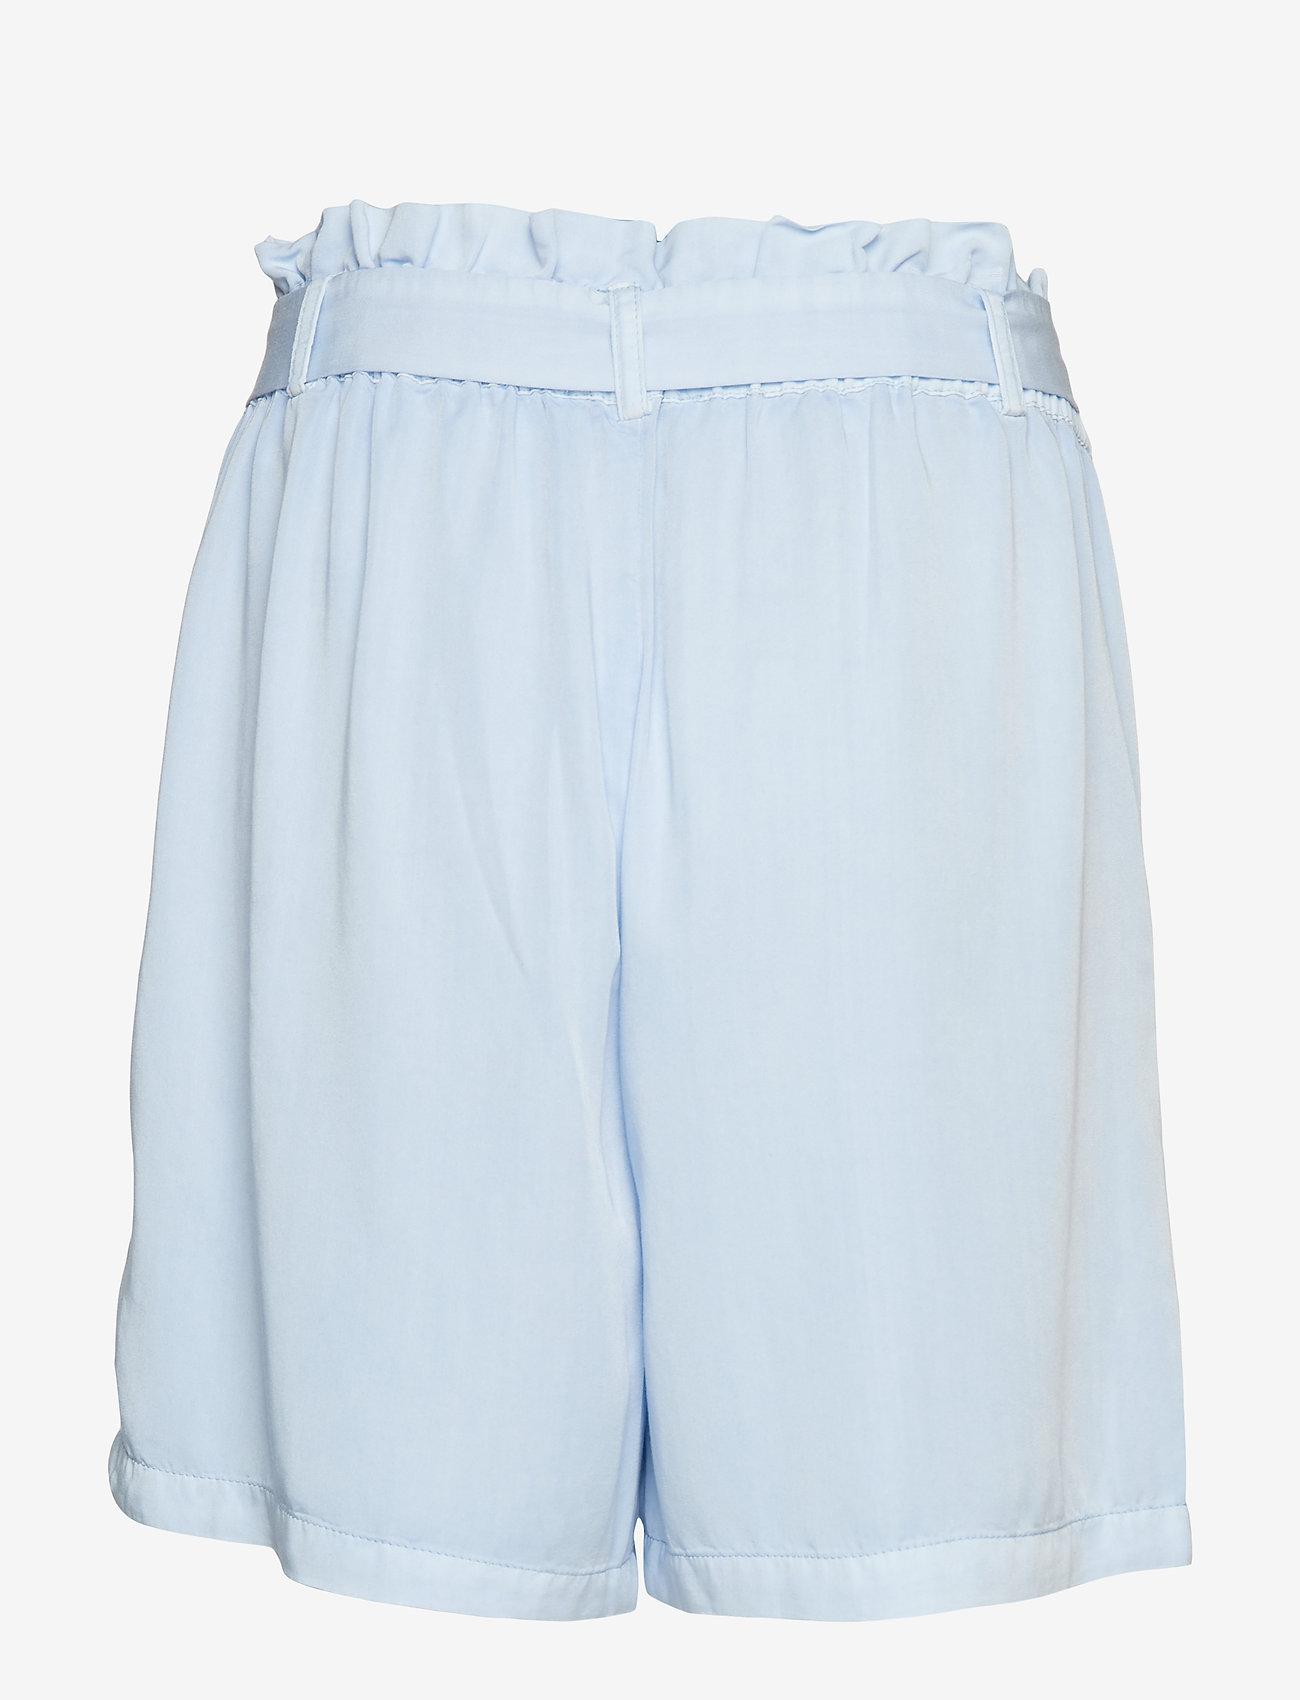 Modström - Ocean shorts - shorts casual - blue wash - 1